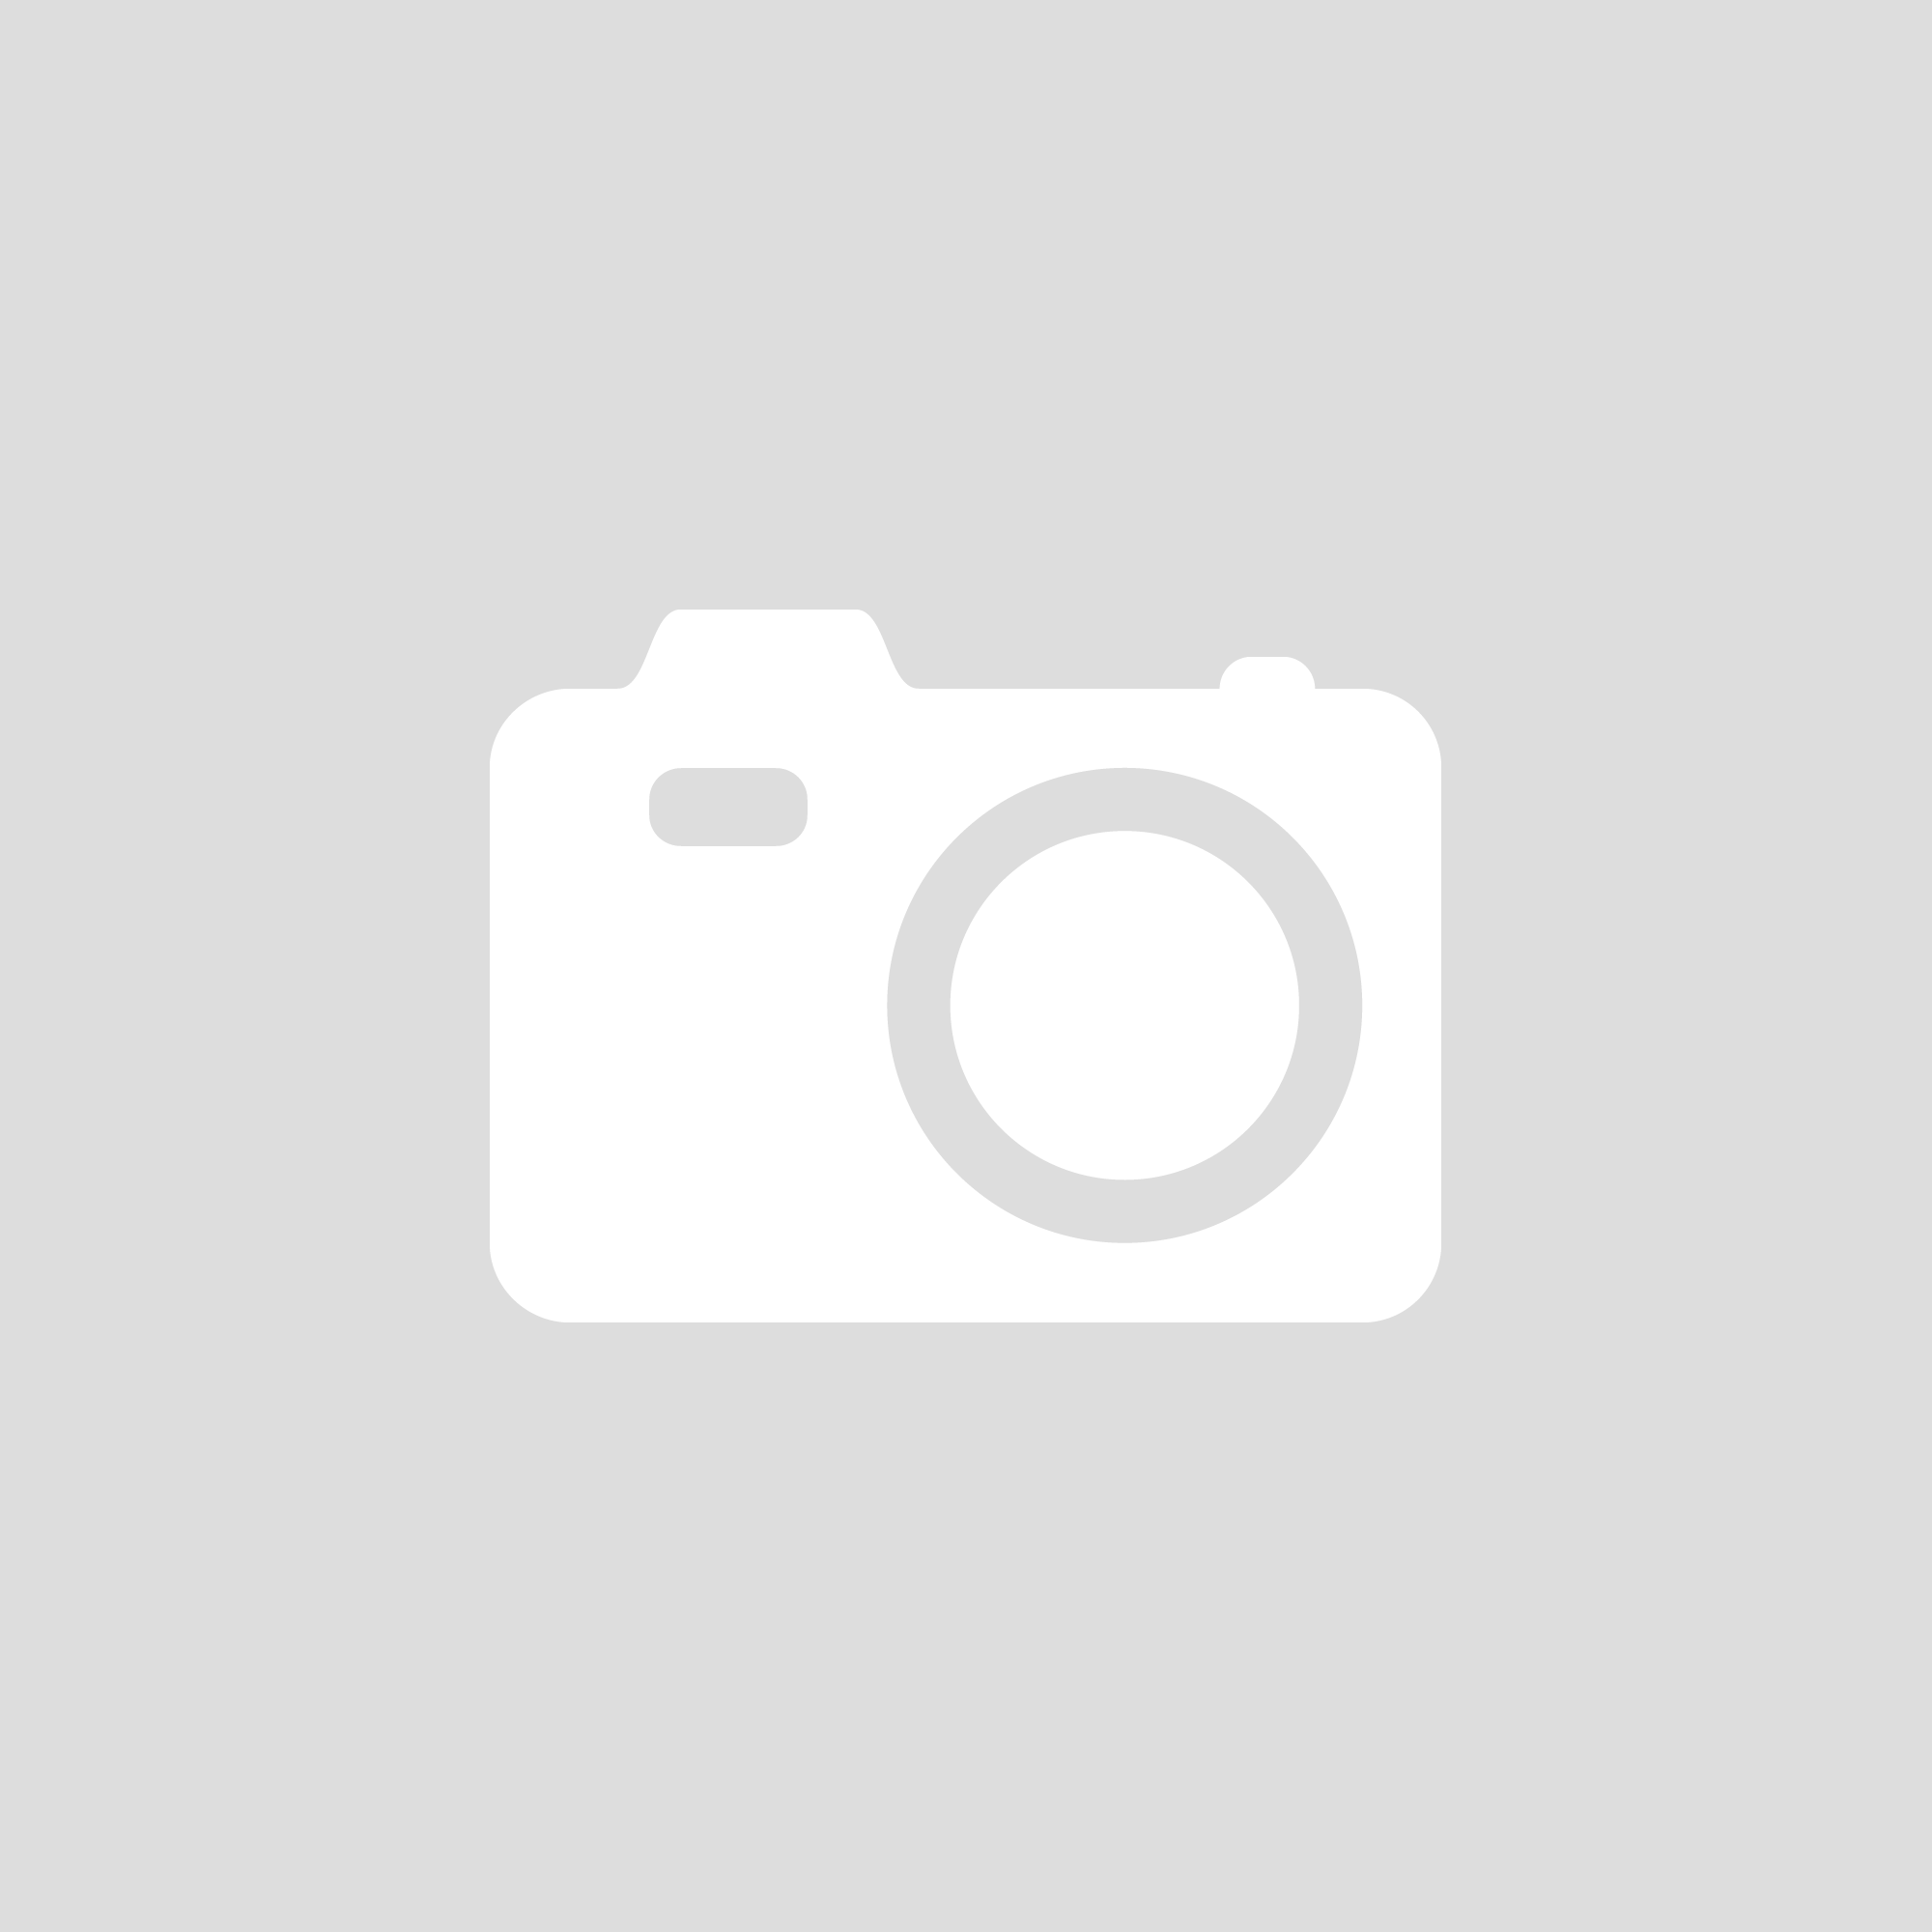 Crystal Tulip Damask Soft Grey Wallpaper by Moda Black Label 241